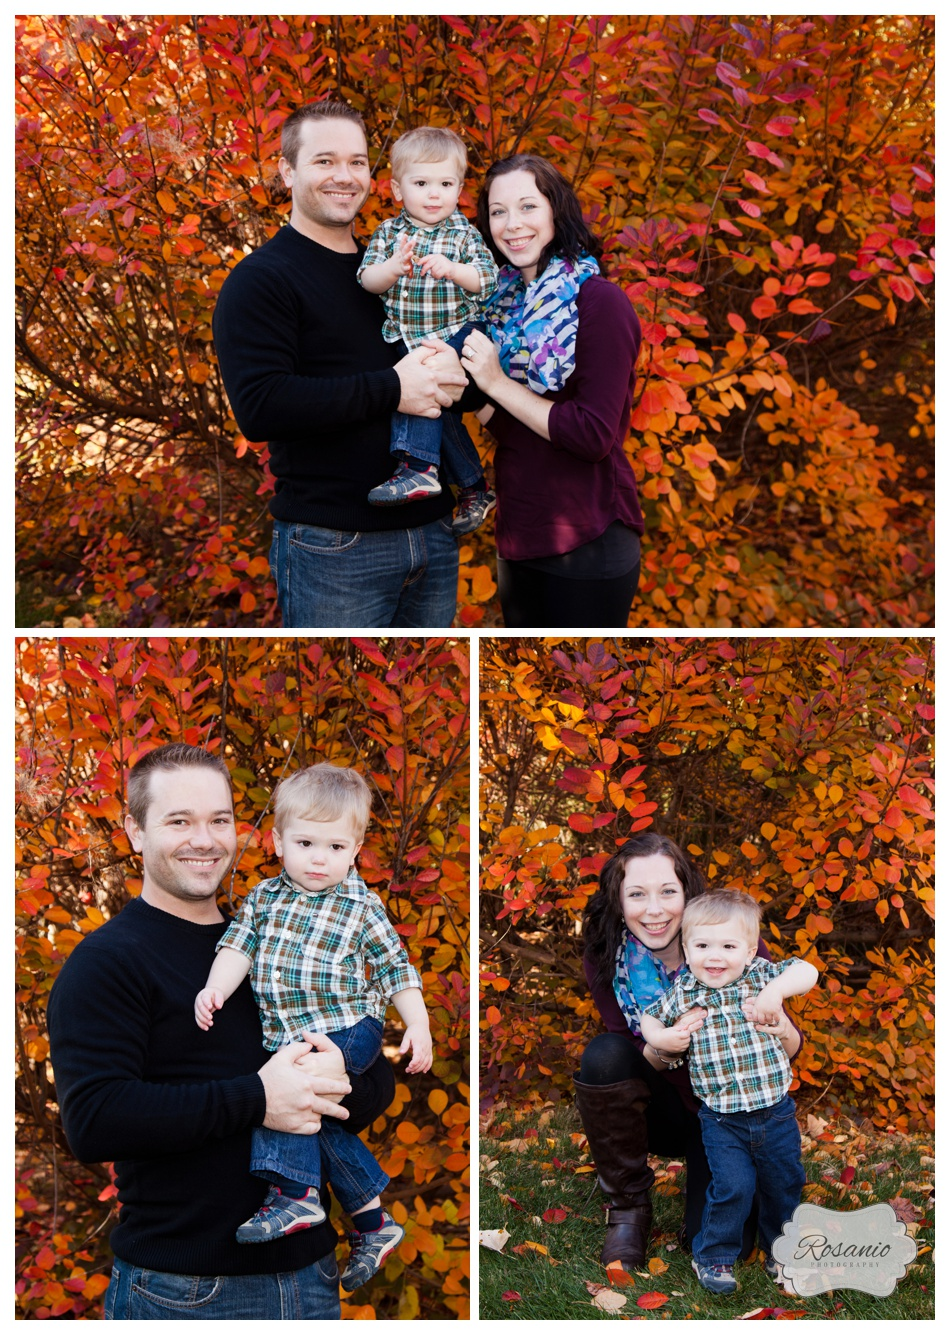 Rosanio Photography | Atkinson Common, Newburyport MA | Massachusetts Family Photographer_0050.jpg